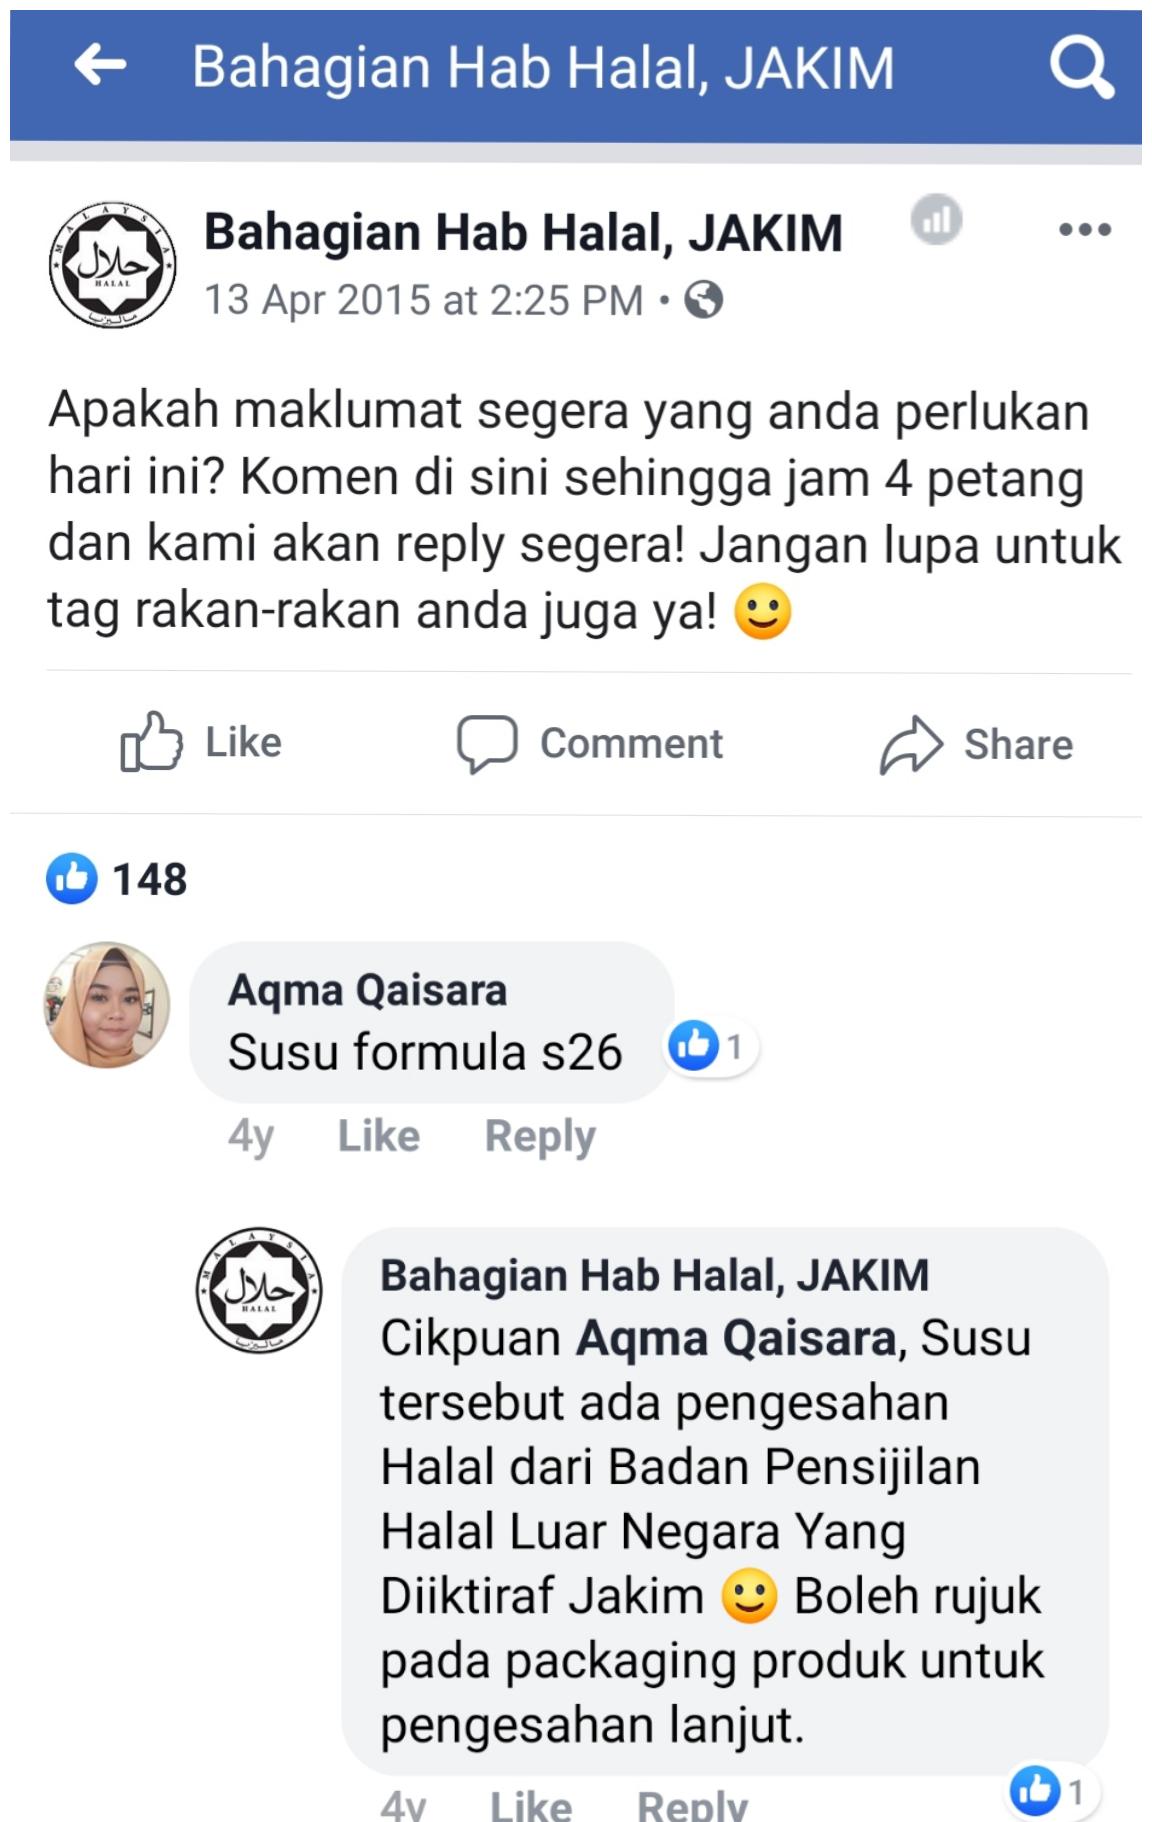 feedback s26 review malaysia testimoni susu s26 sample susu s26 s26 0-6 bulan susu s26 price status halal susu s26 susu formula anak sembelit